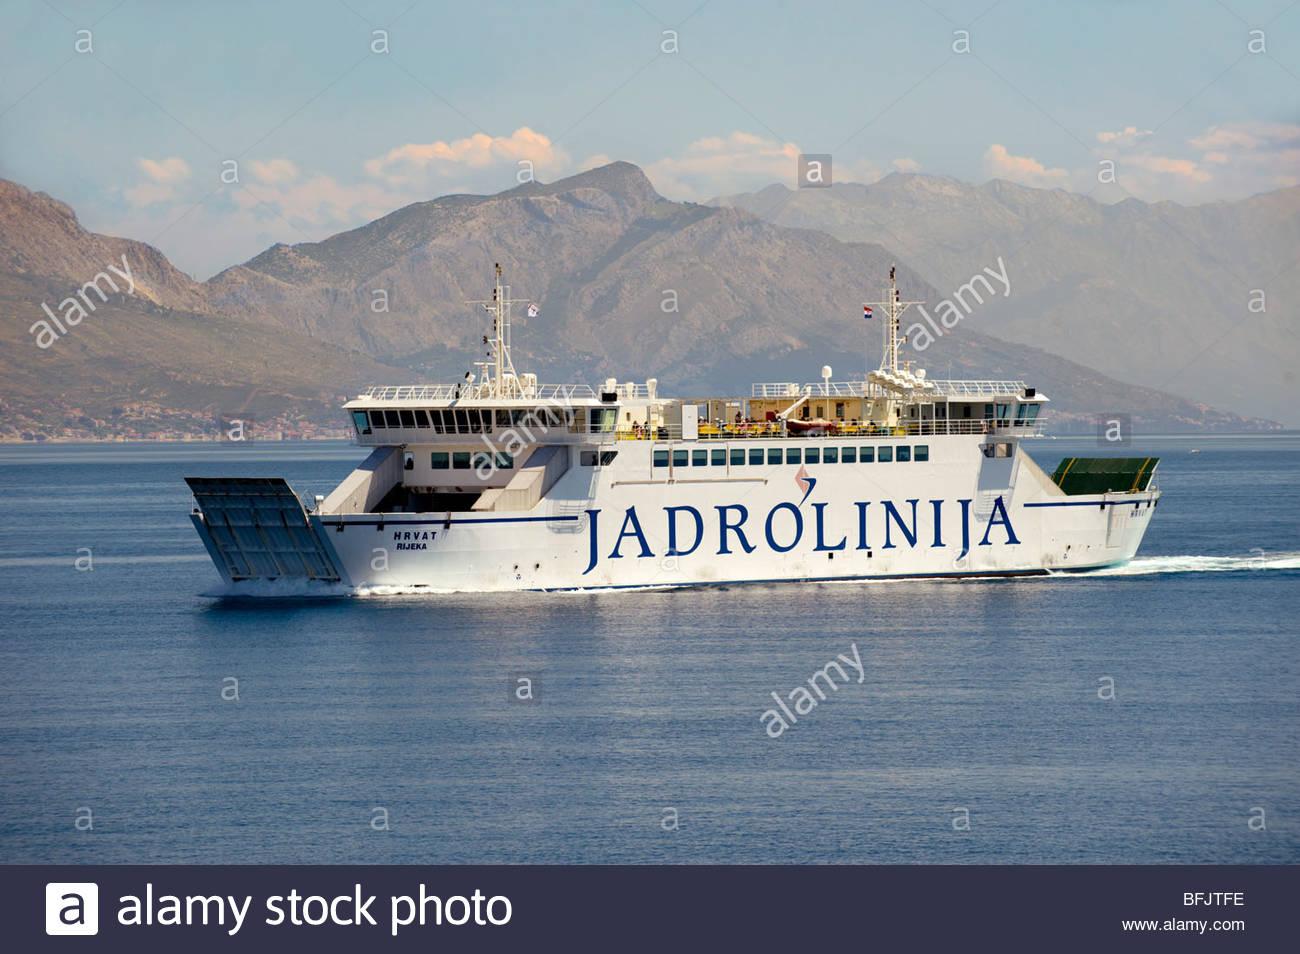 Jardolinja Split to Brac car Ferry, Croatian Islands, Croatia, Dalmatia - Stock Image